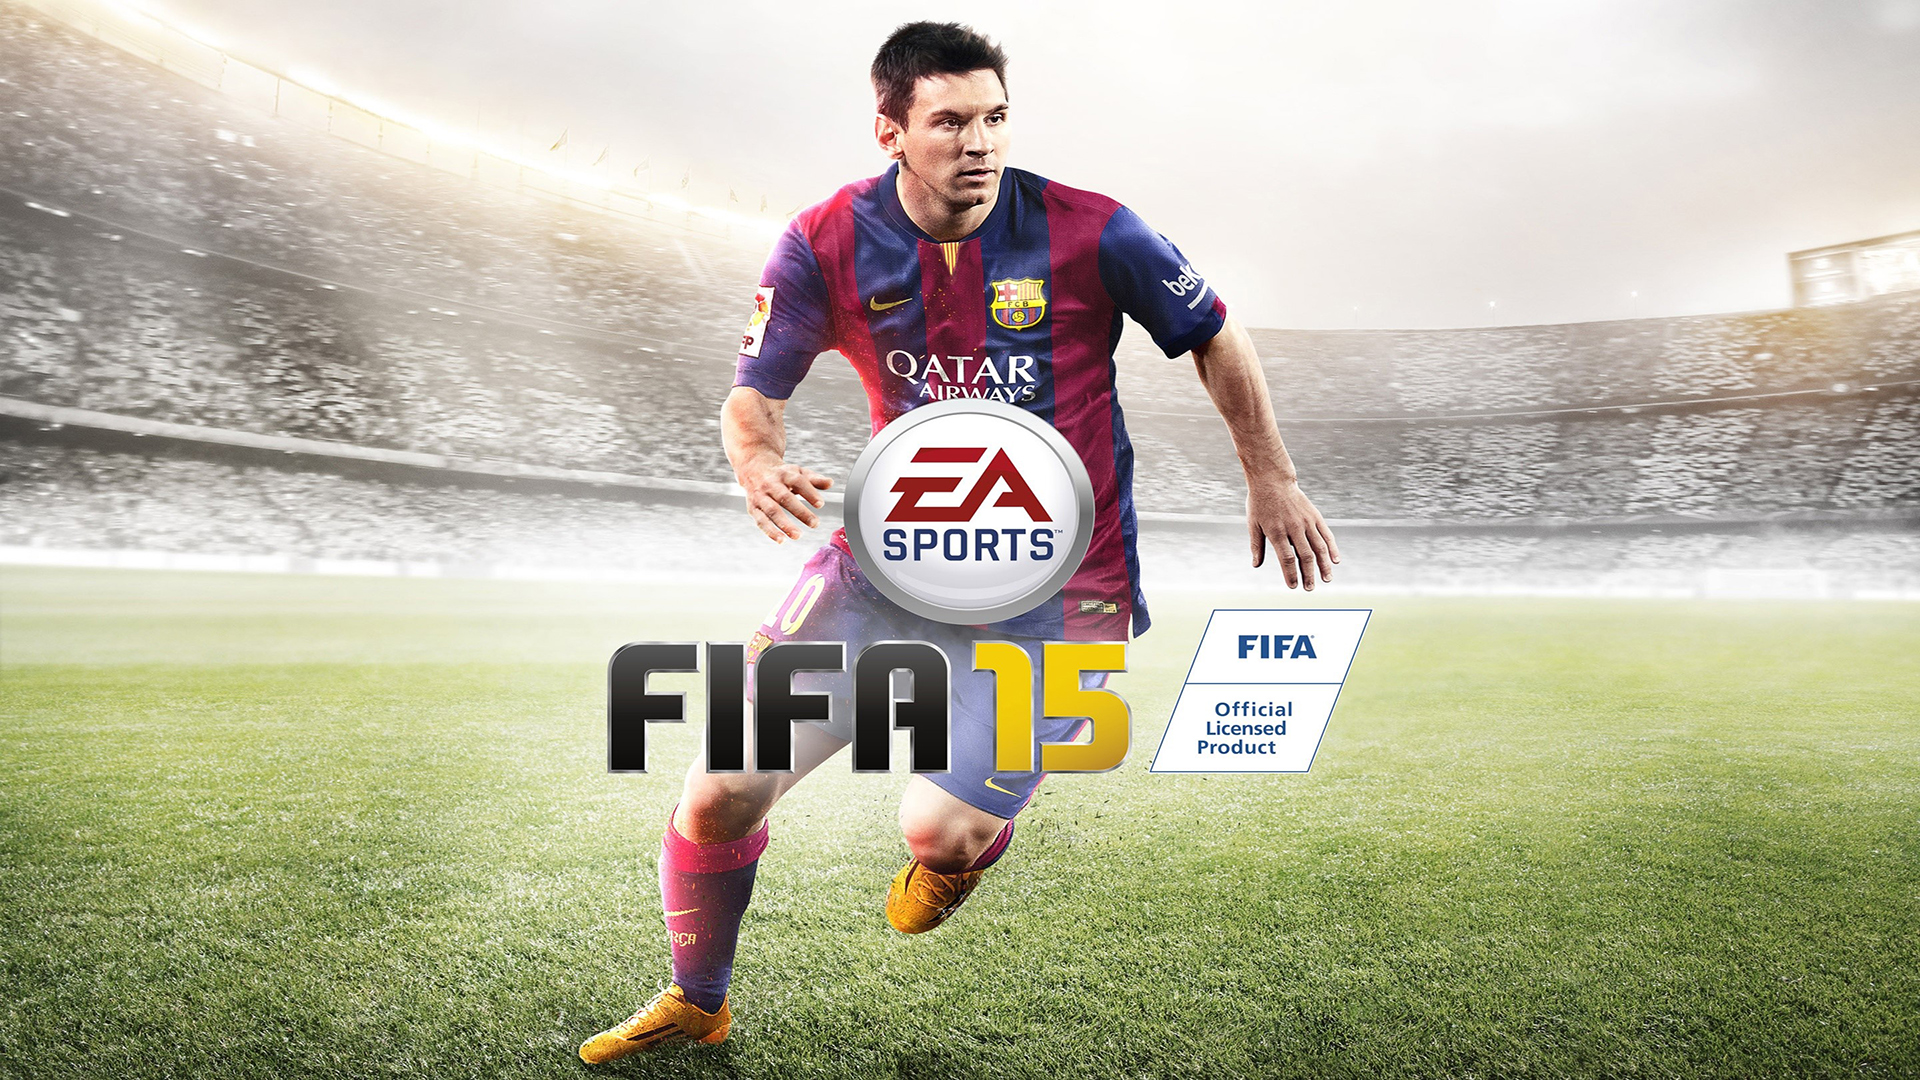 fifa 17 torrent download